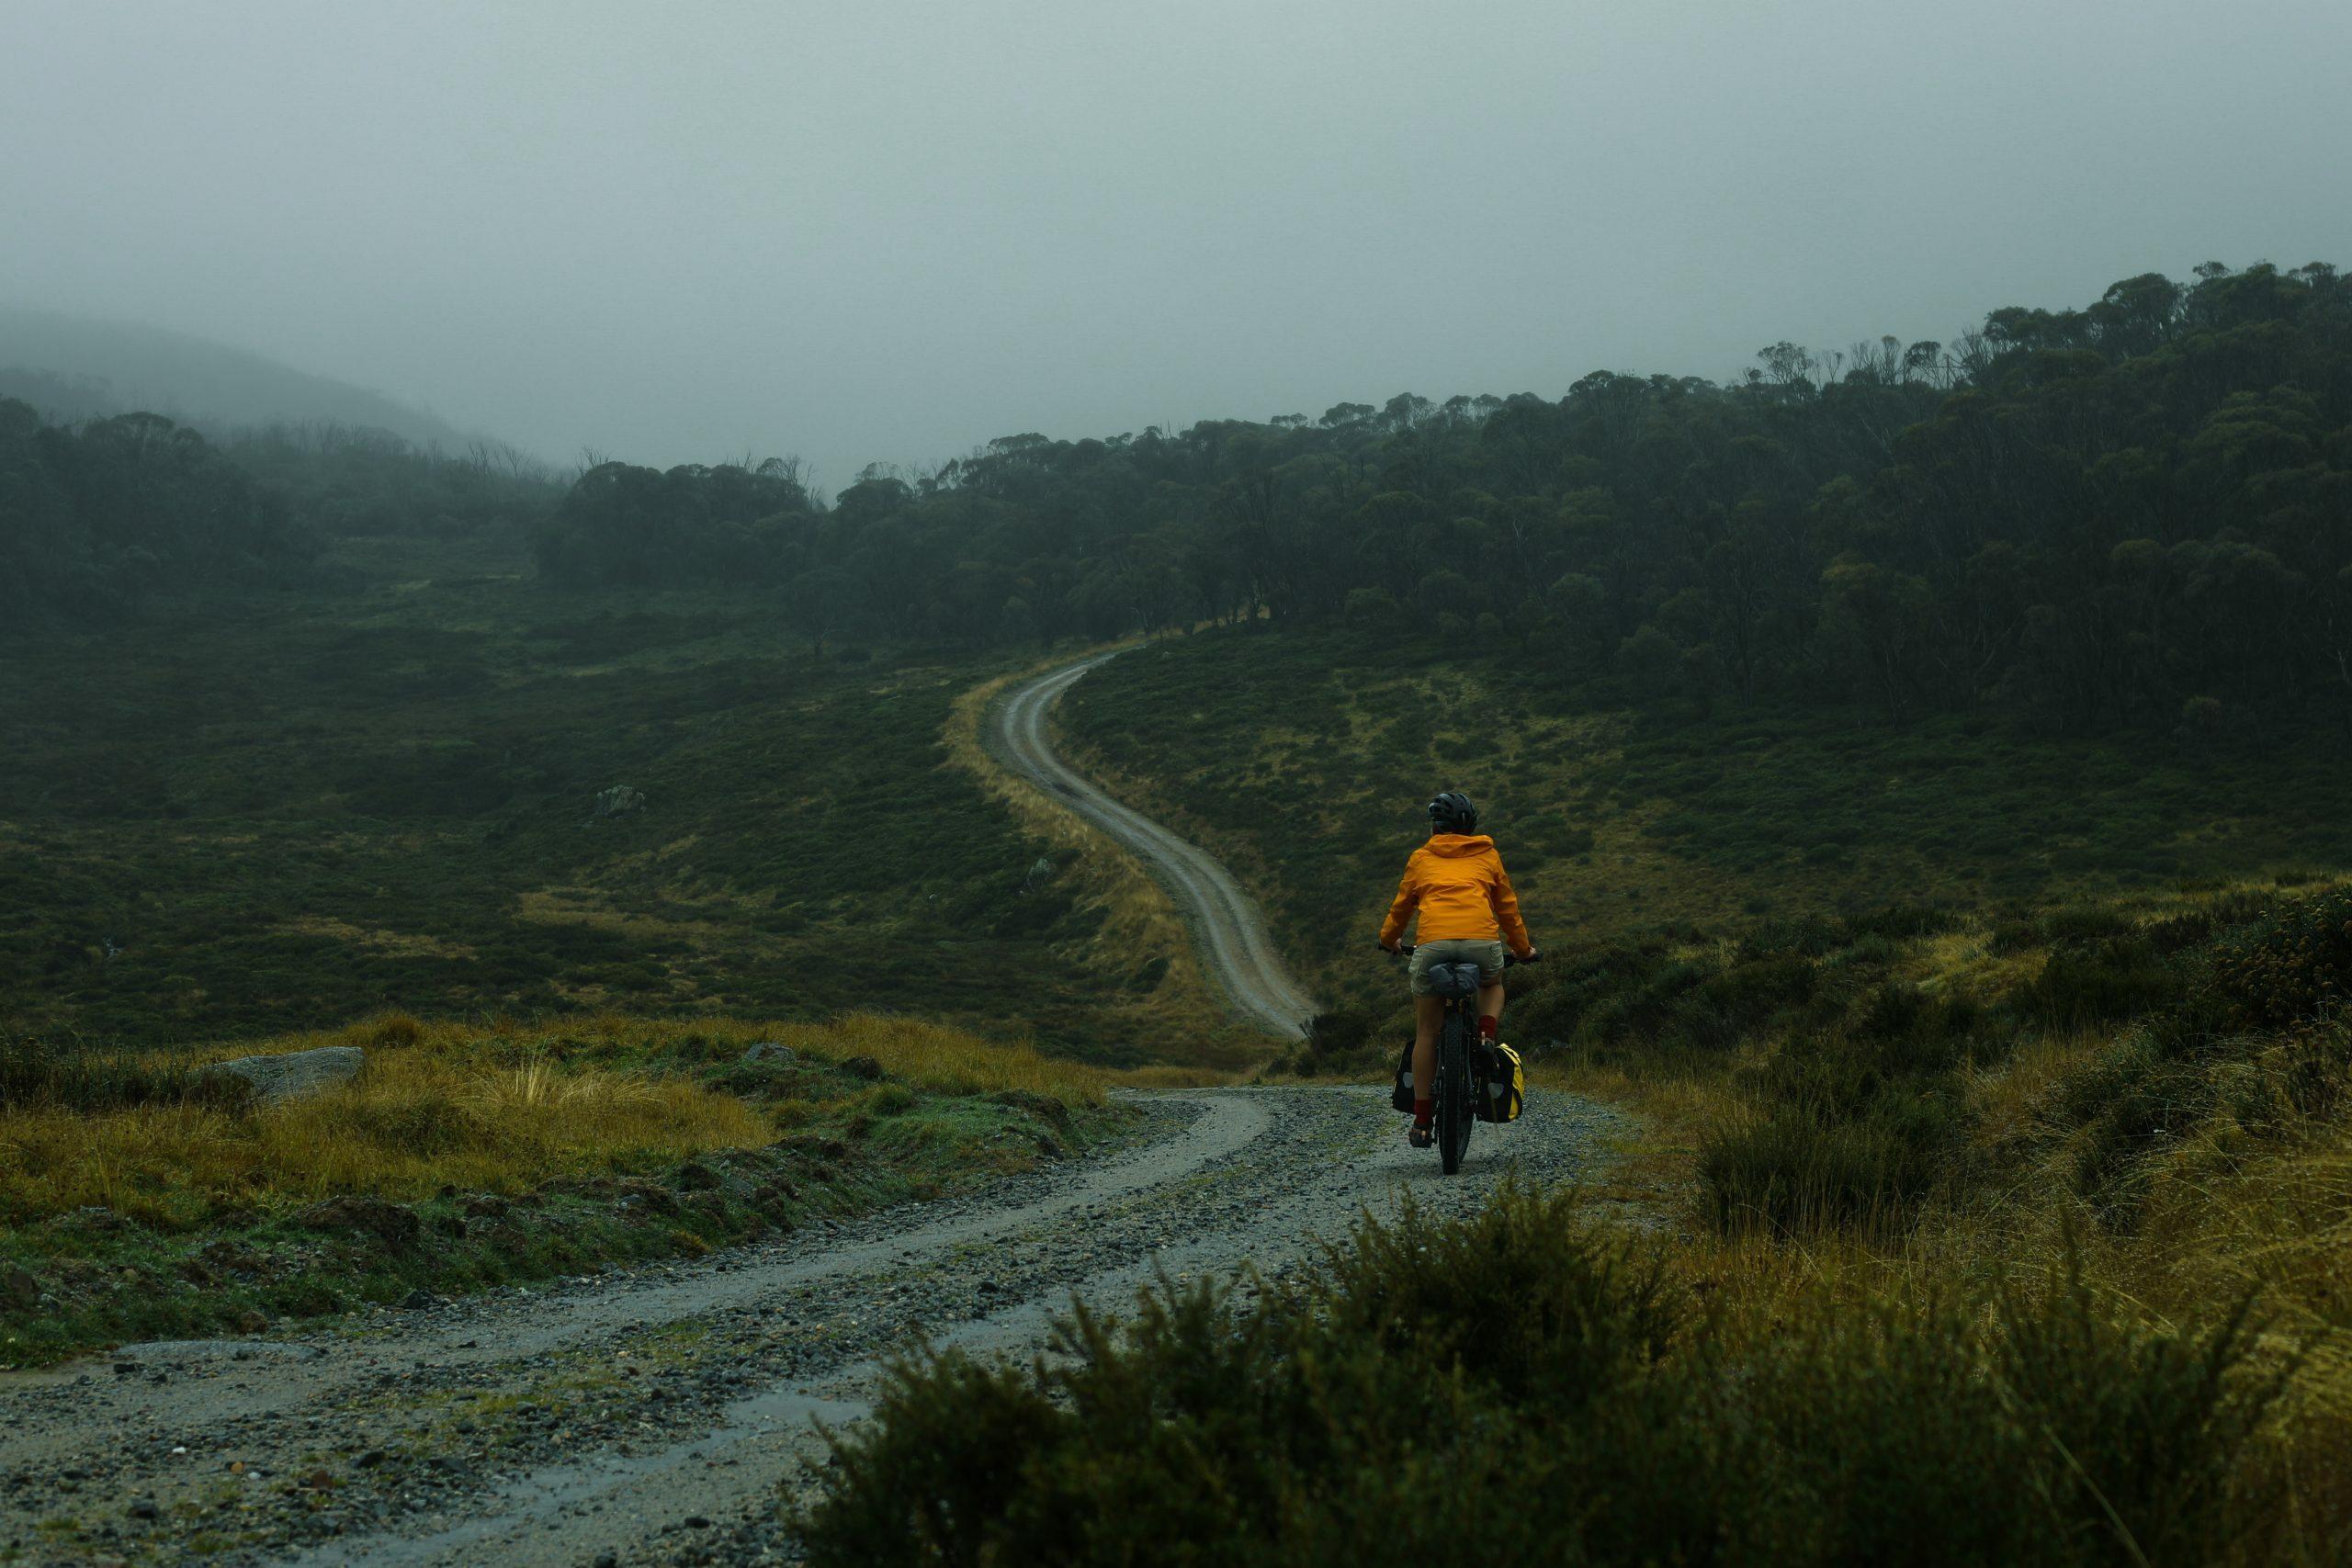 Bikepacking up Schlink Pass Road, Kosciuszko National Park